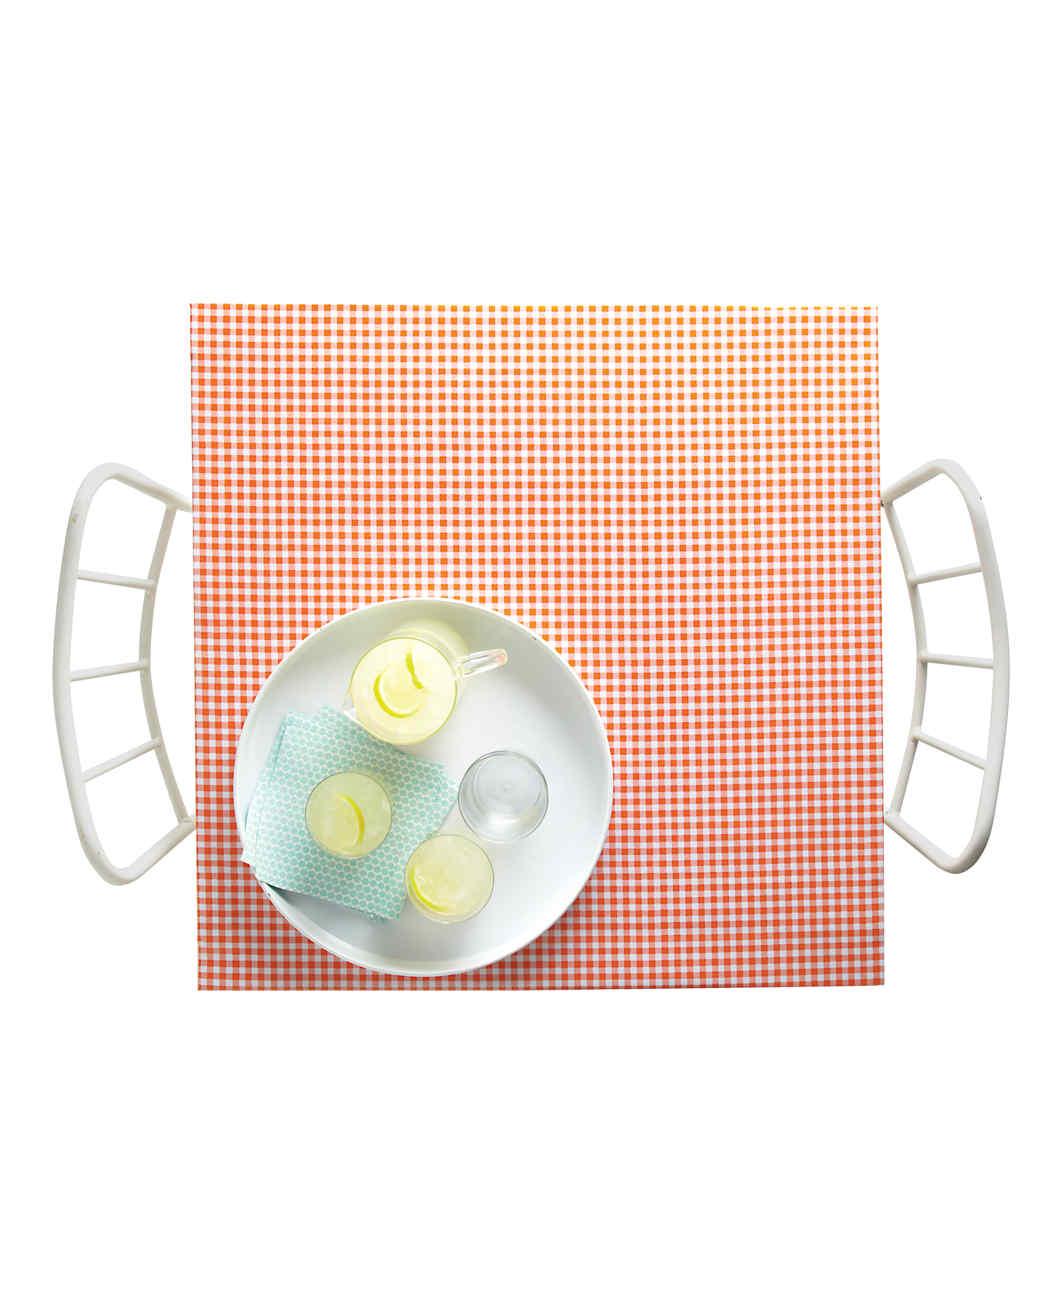 msl-good-things-oil-cloth-table-033-mld109975.jpg